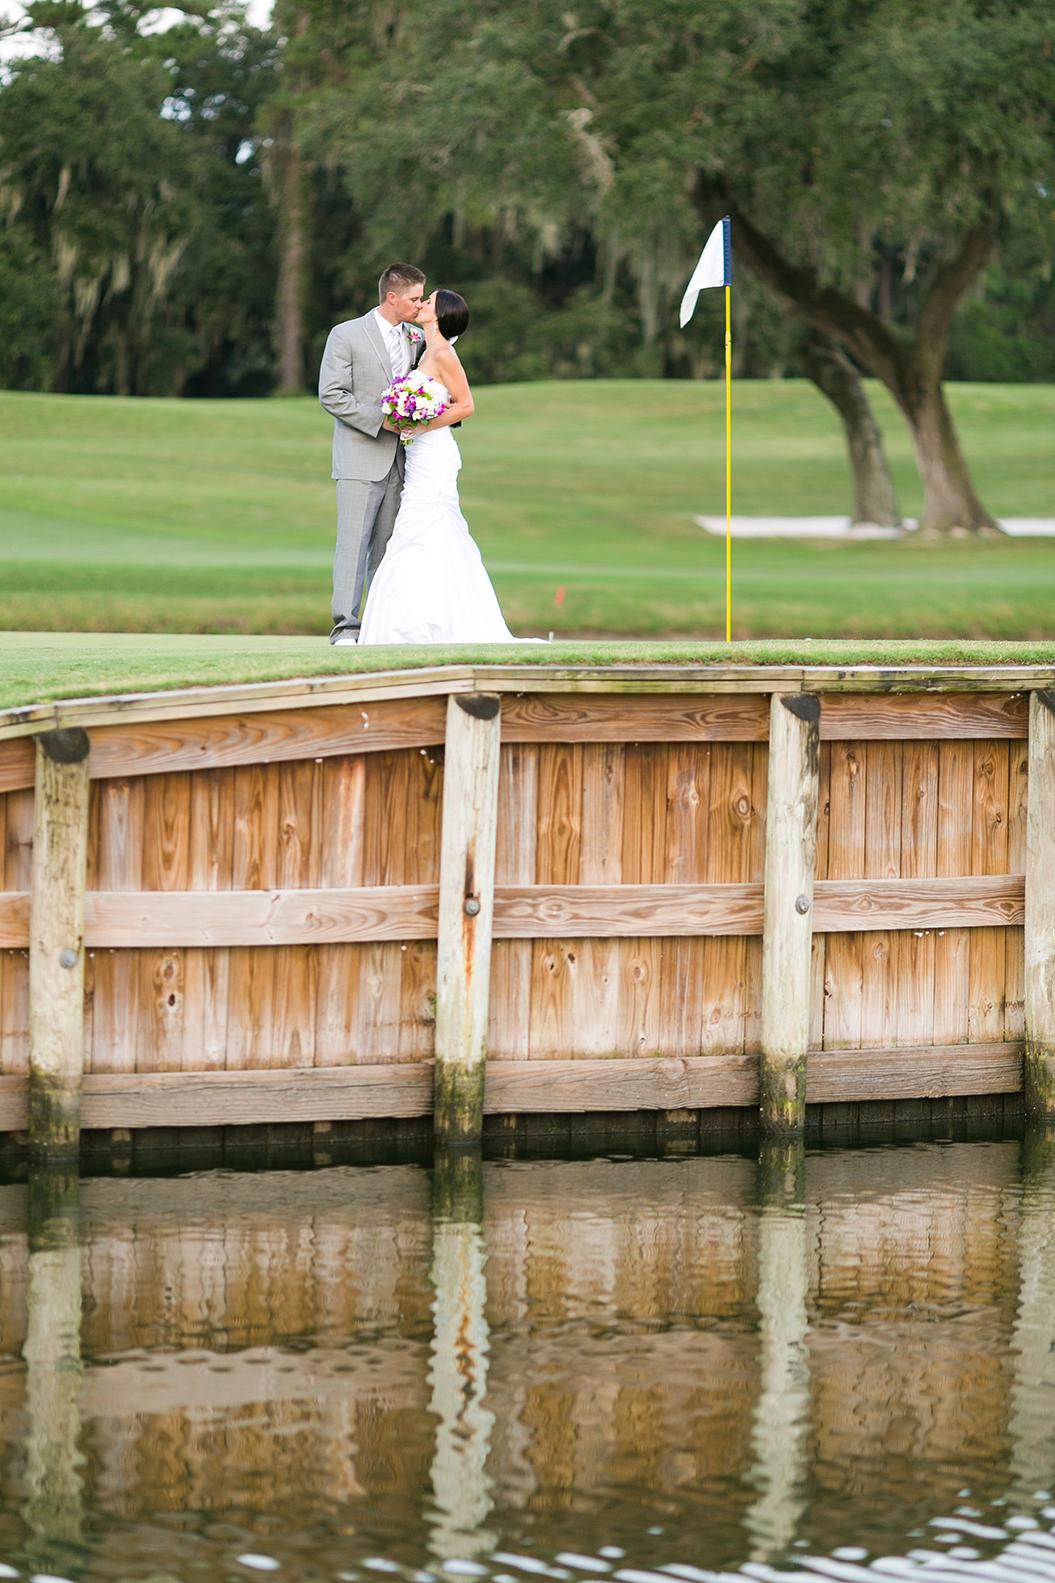 adam-szarmack-tpc-sawgrass-ponte-vedra-wedding-photographer-PZ3A9726.jpg